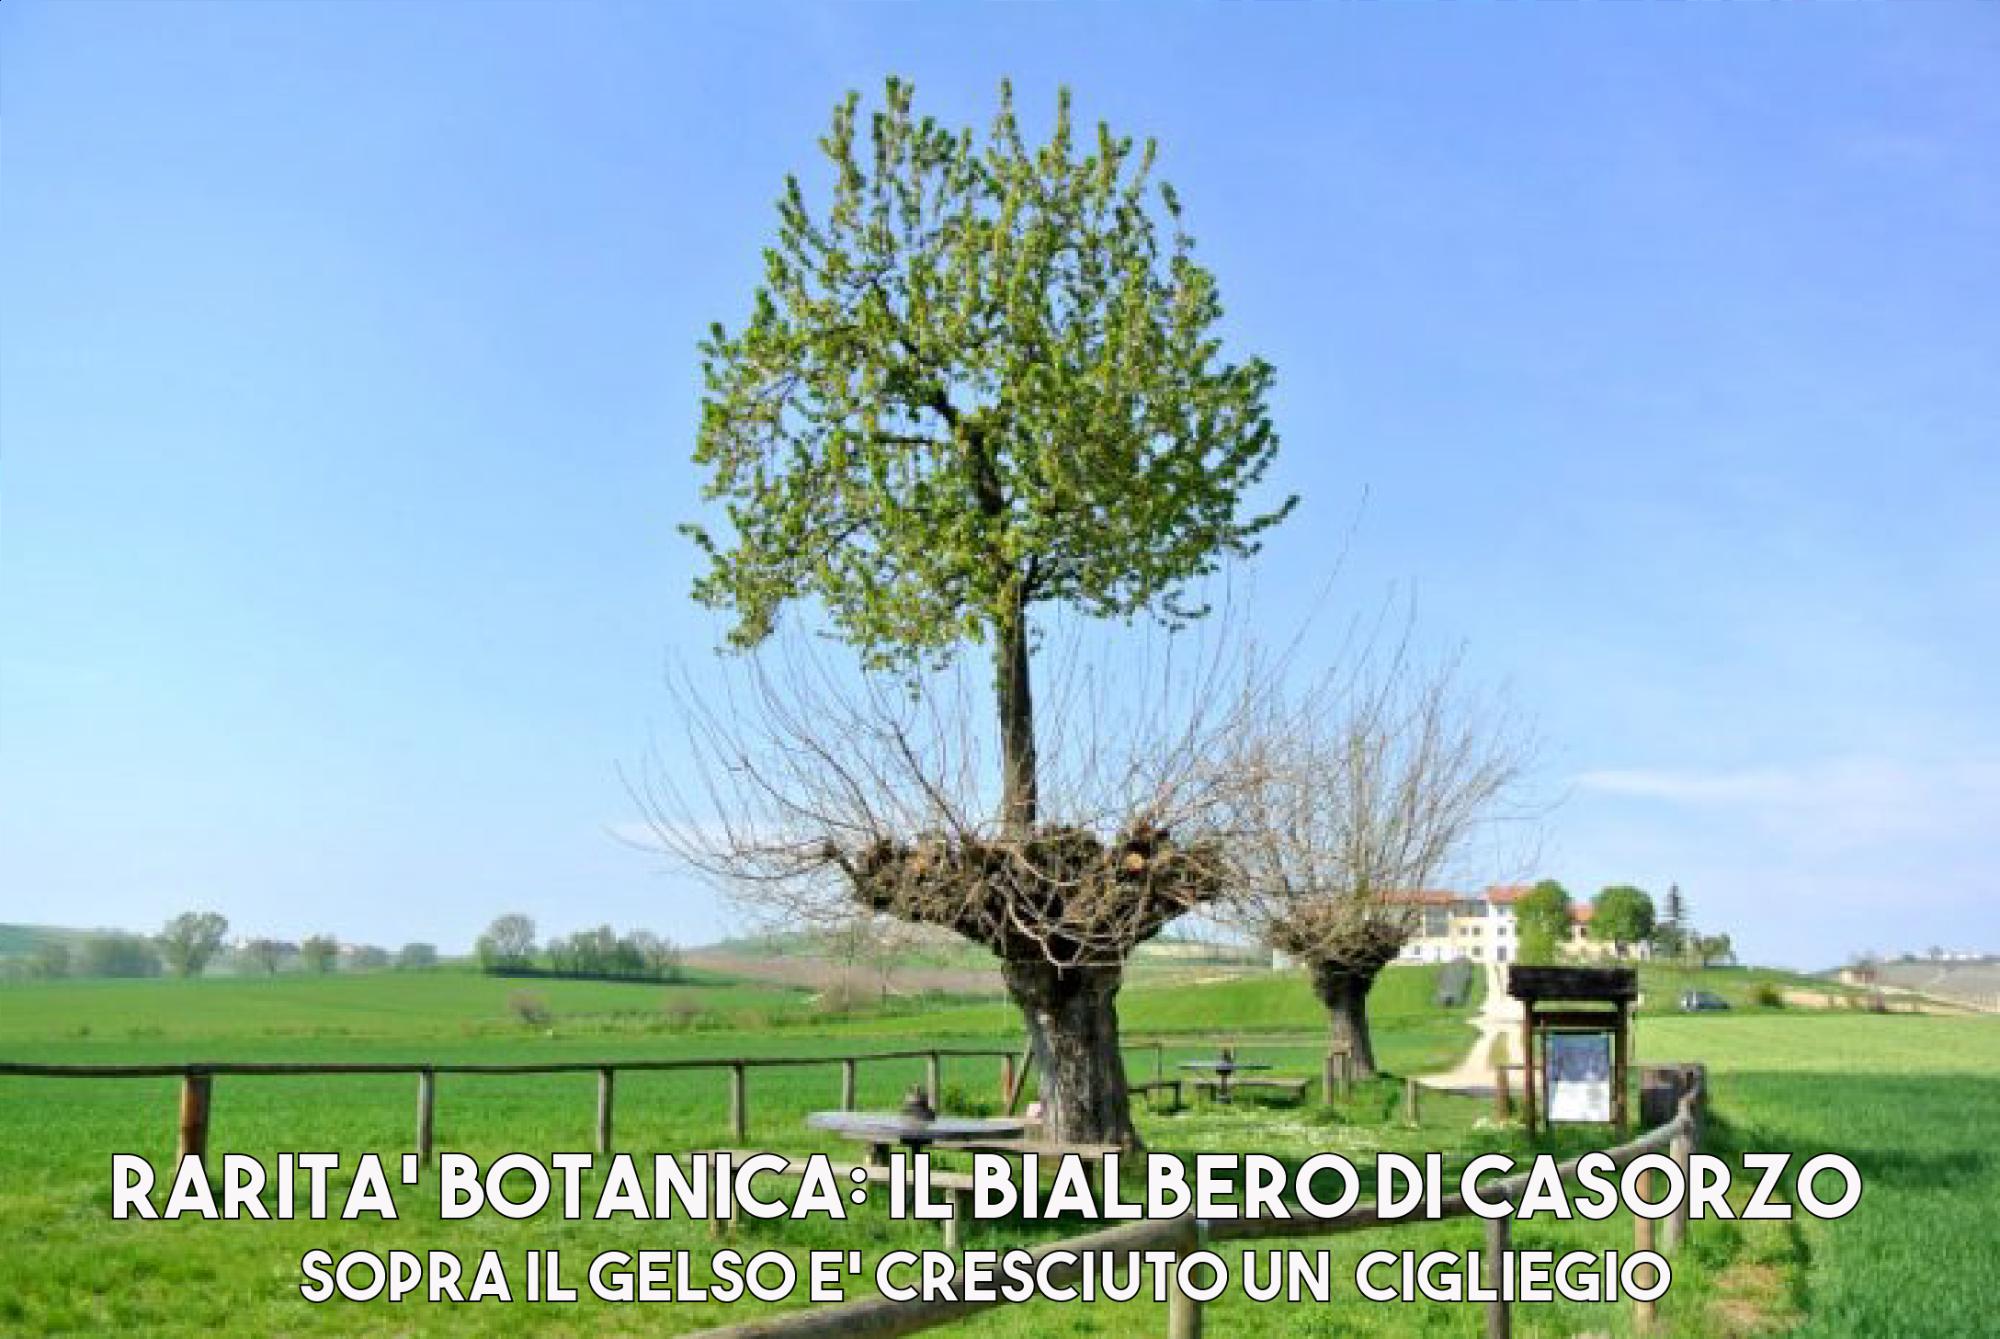 bialbero-casorzo-1629885854.png